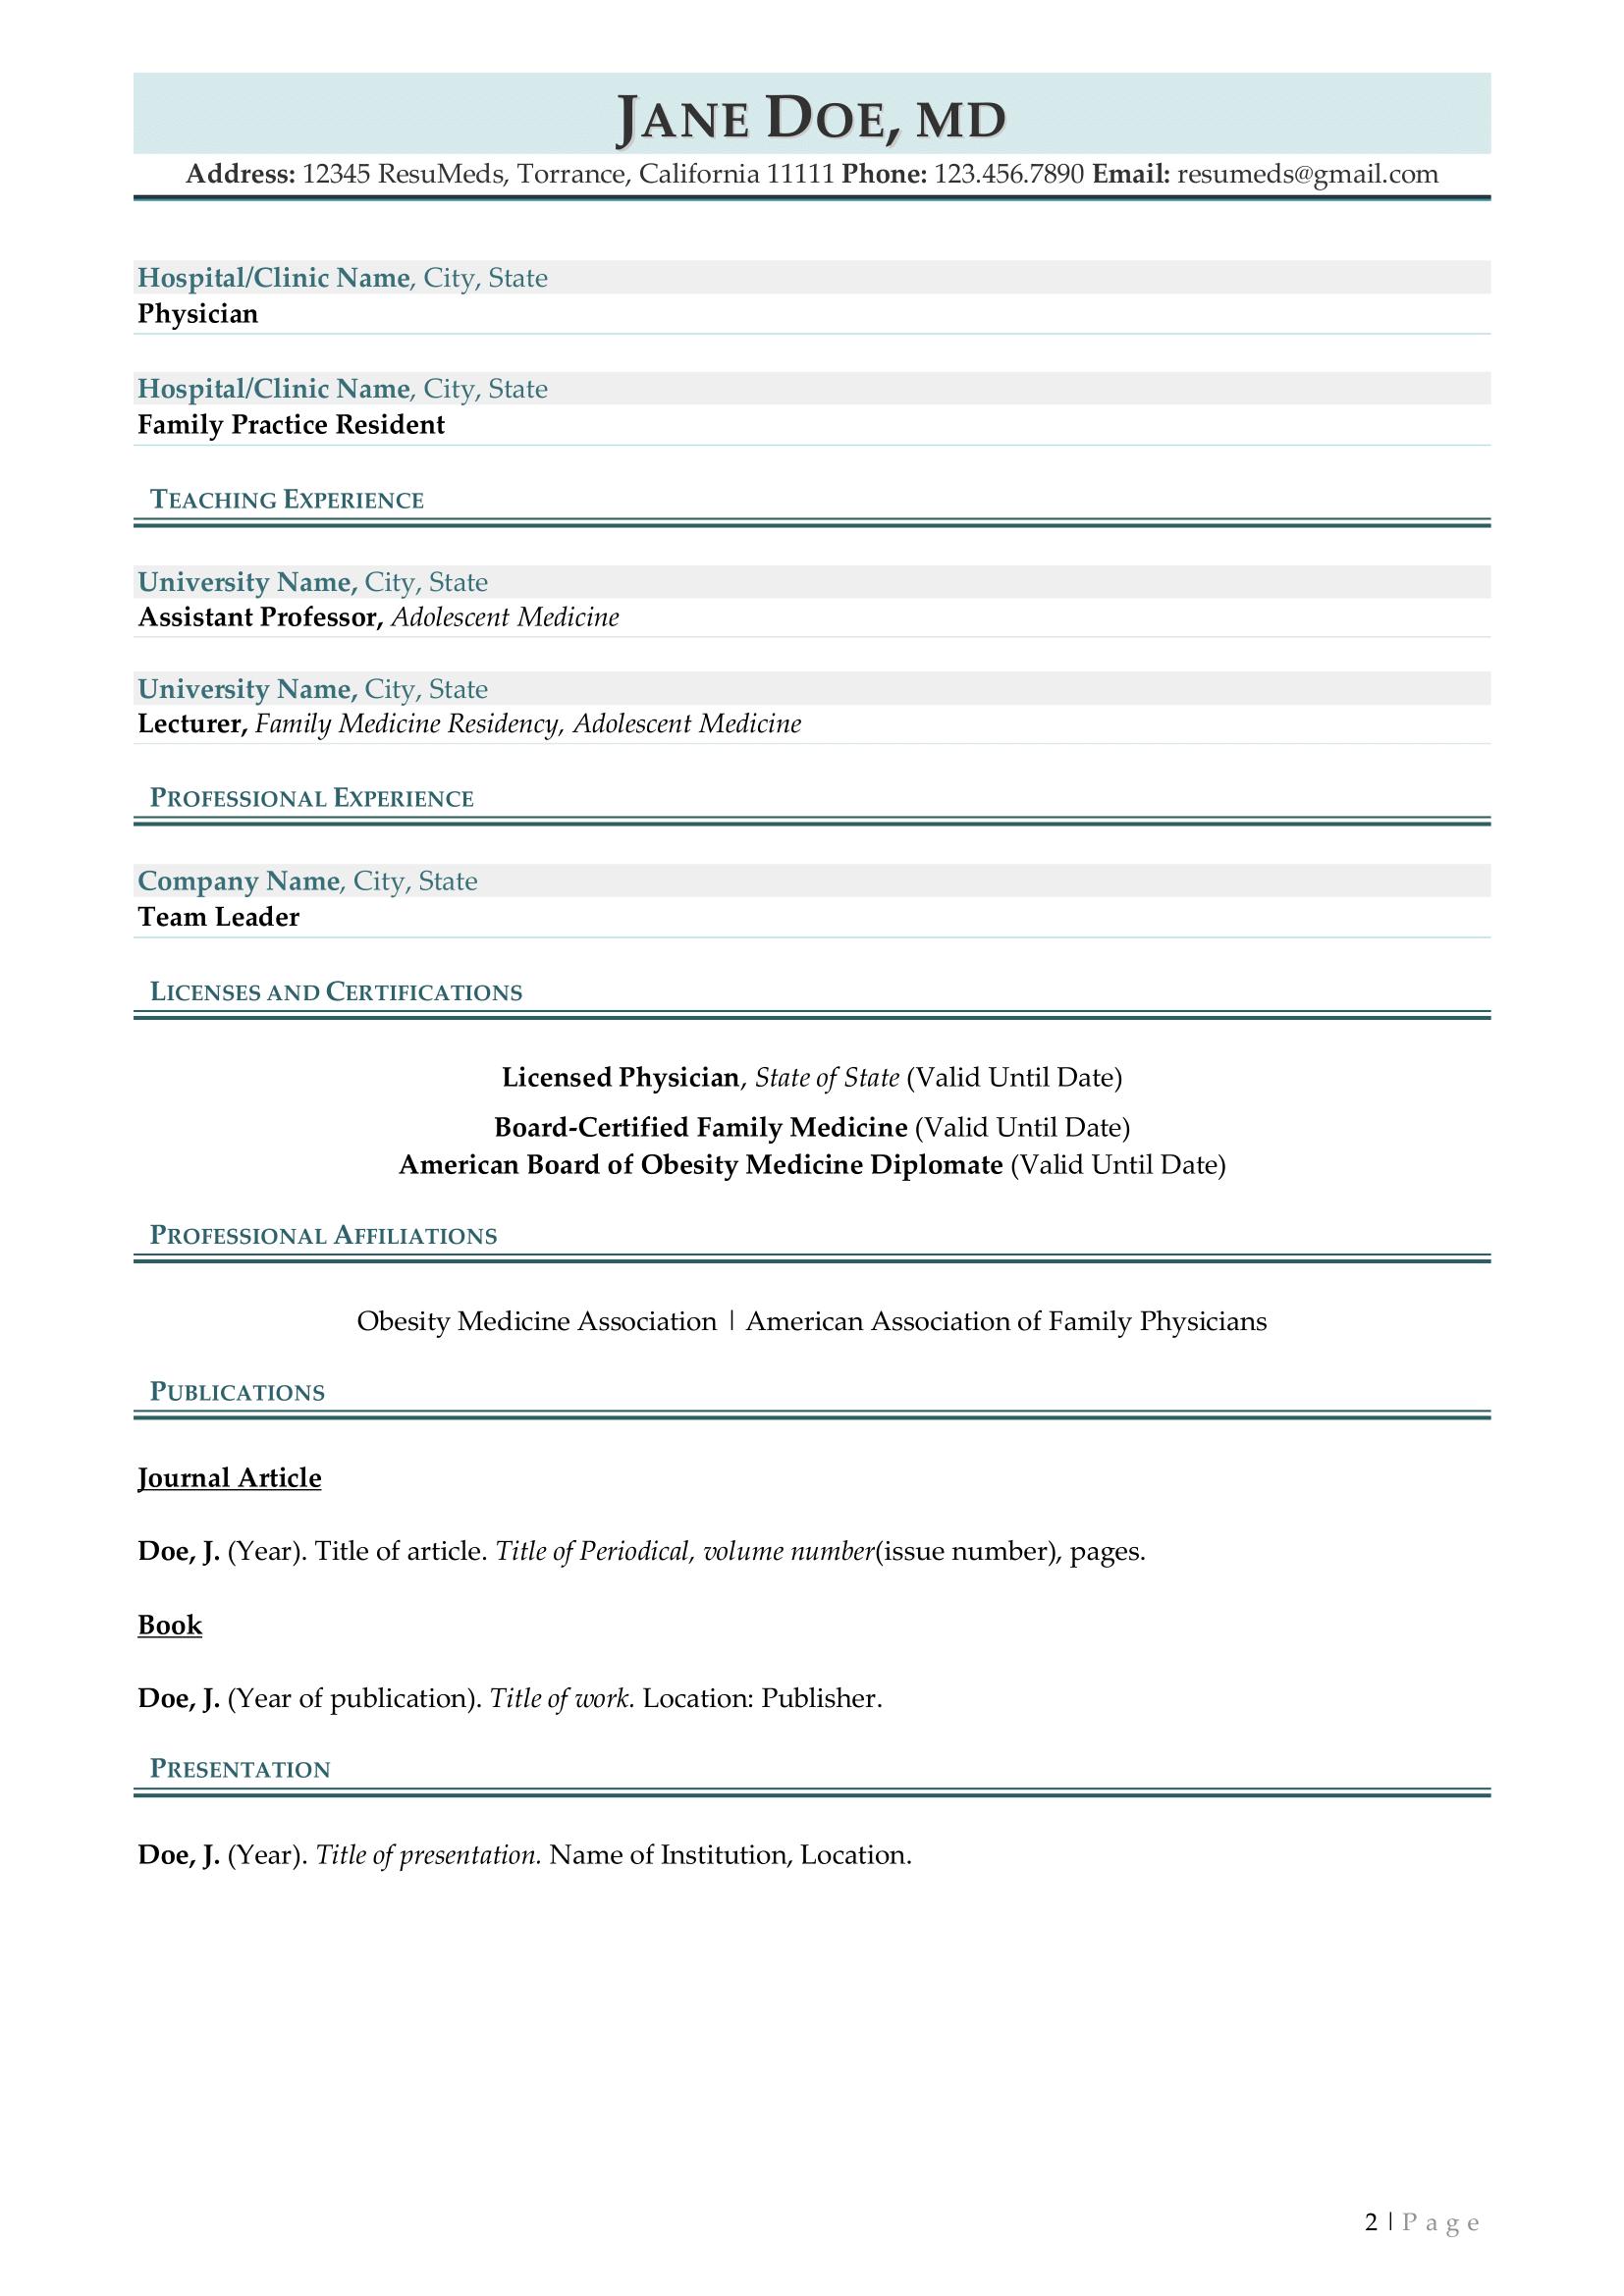 resumeds-physician-cv-example-2